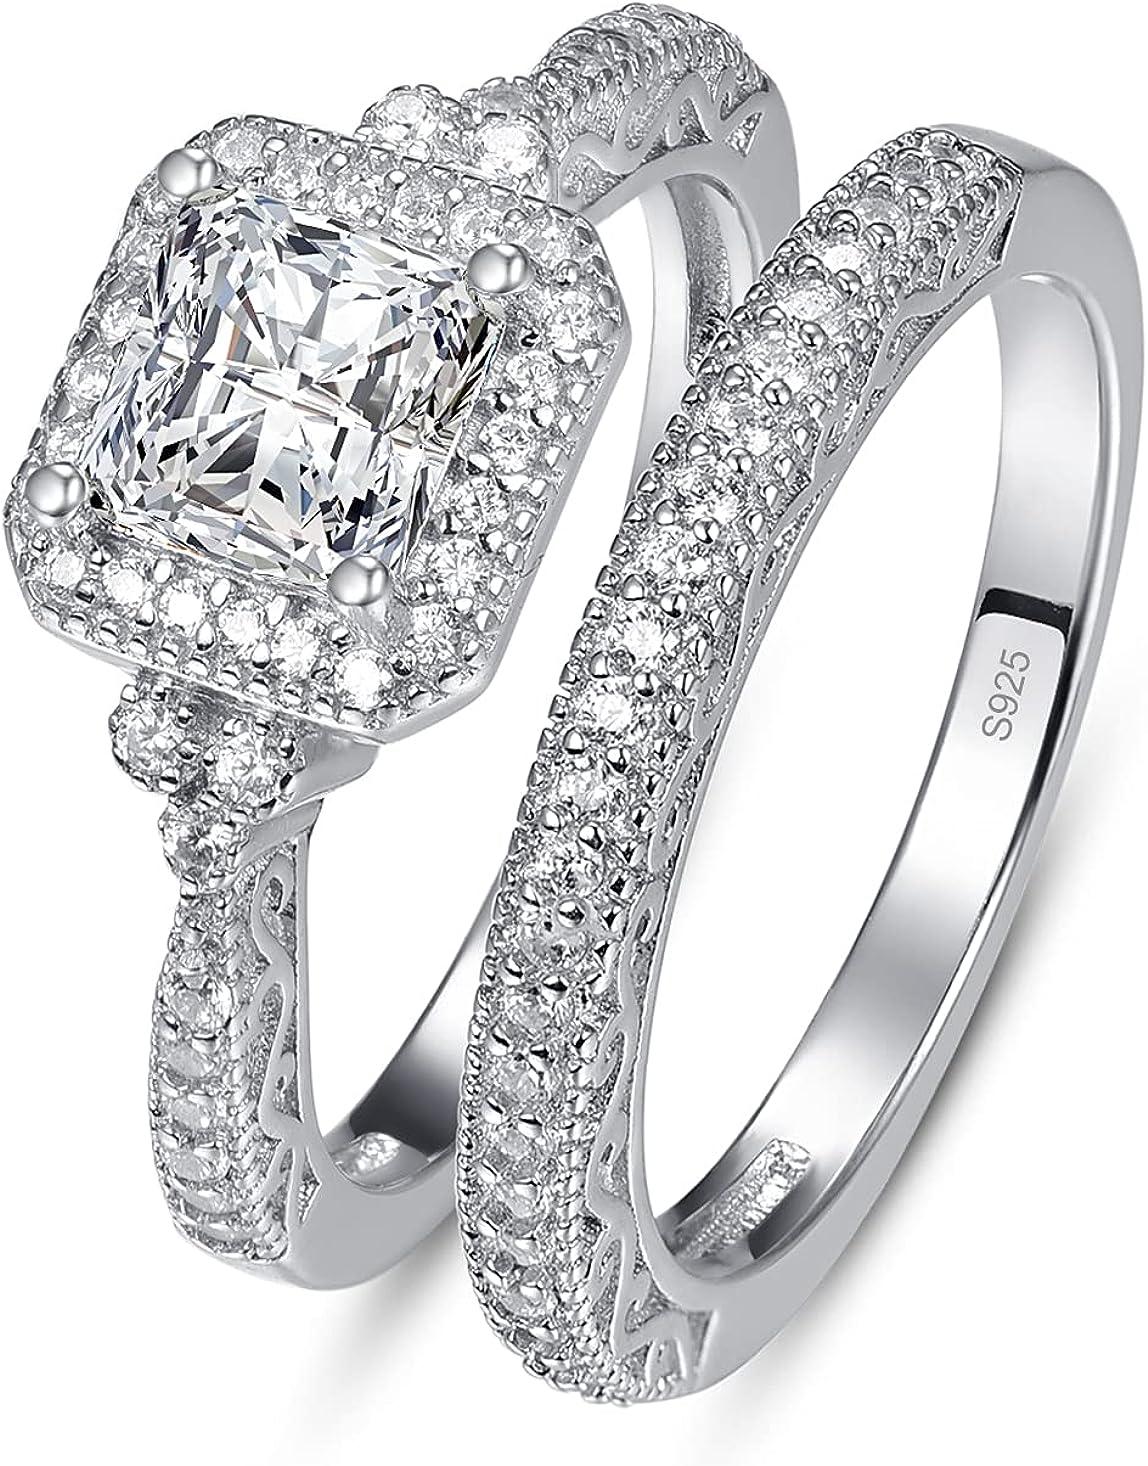 Popular popular YARESUL 925 Sterling Silver Engagement Ring Sale Prince Women Set for